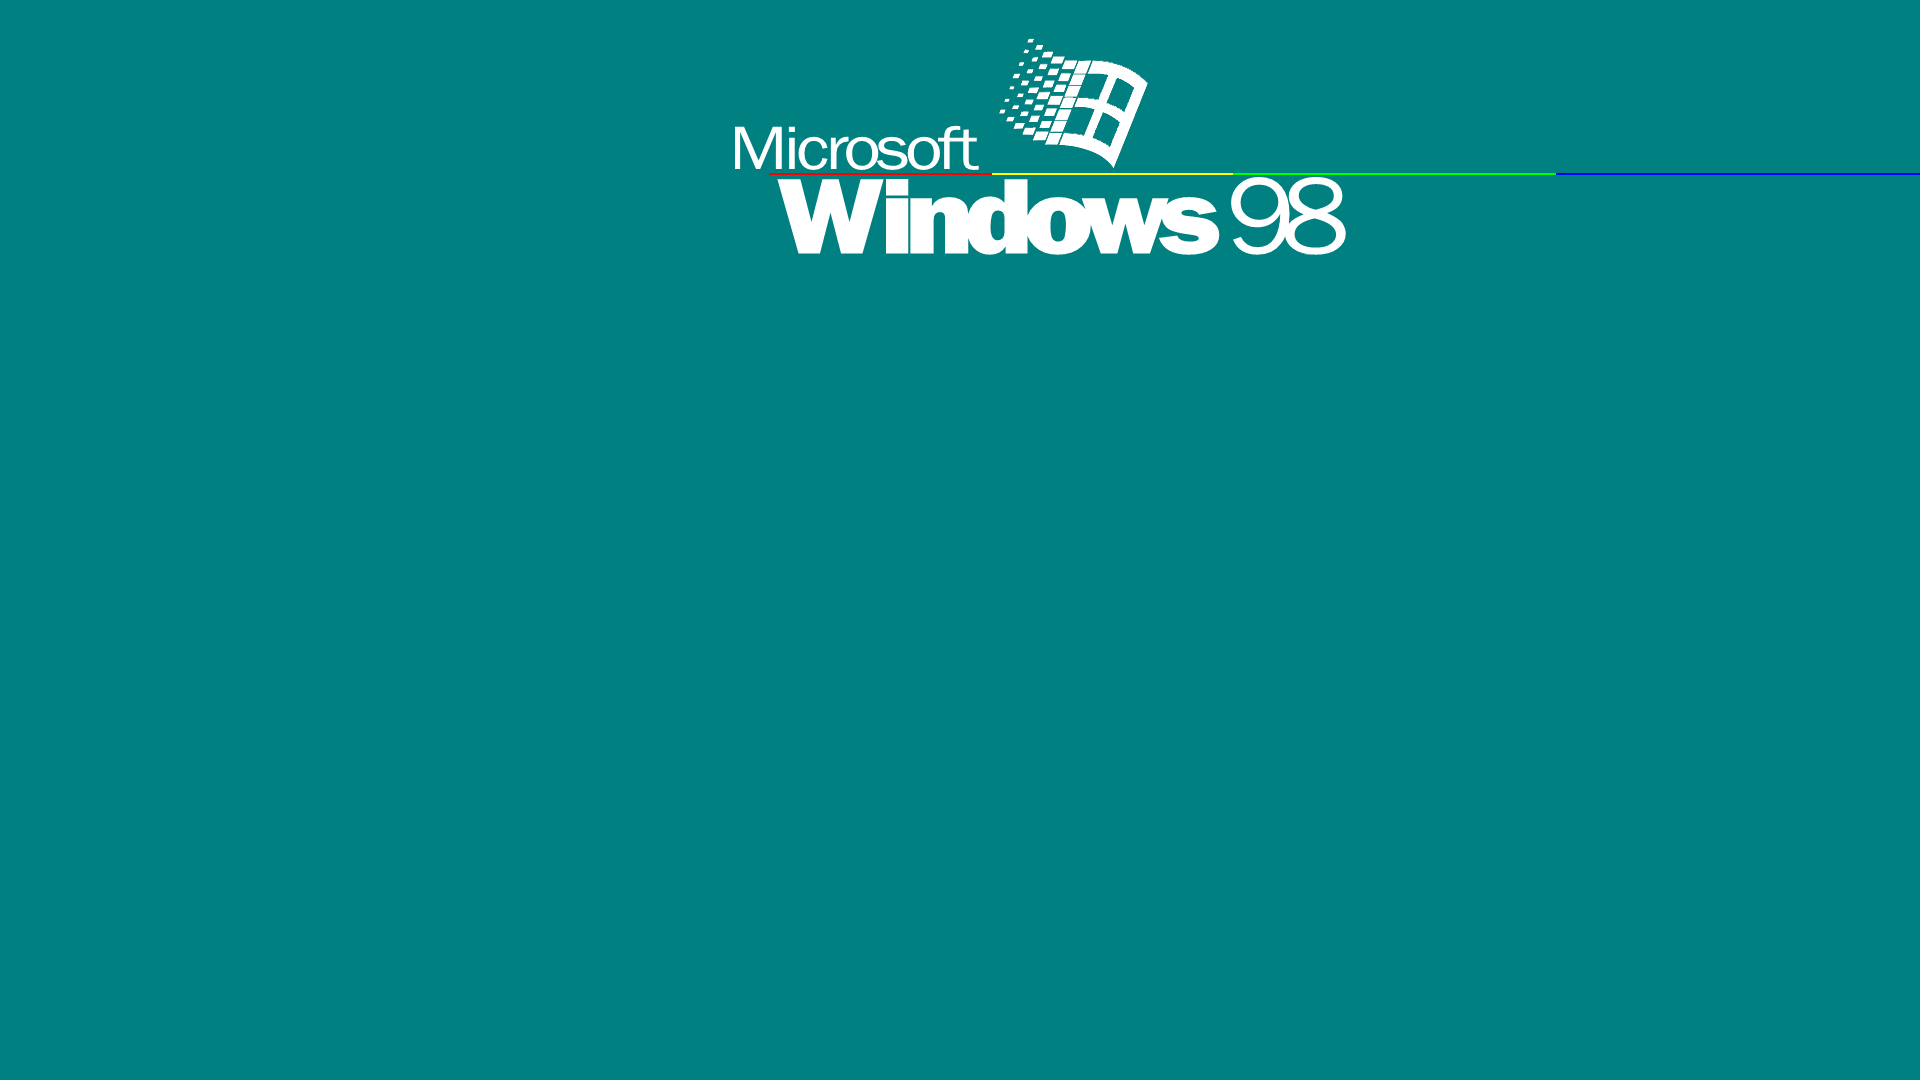 Windows 98 Retro Wallpaper By Axeldragani On DeviantArt